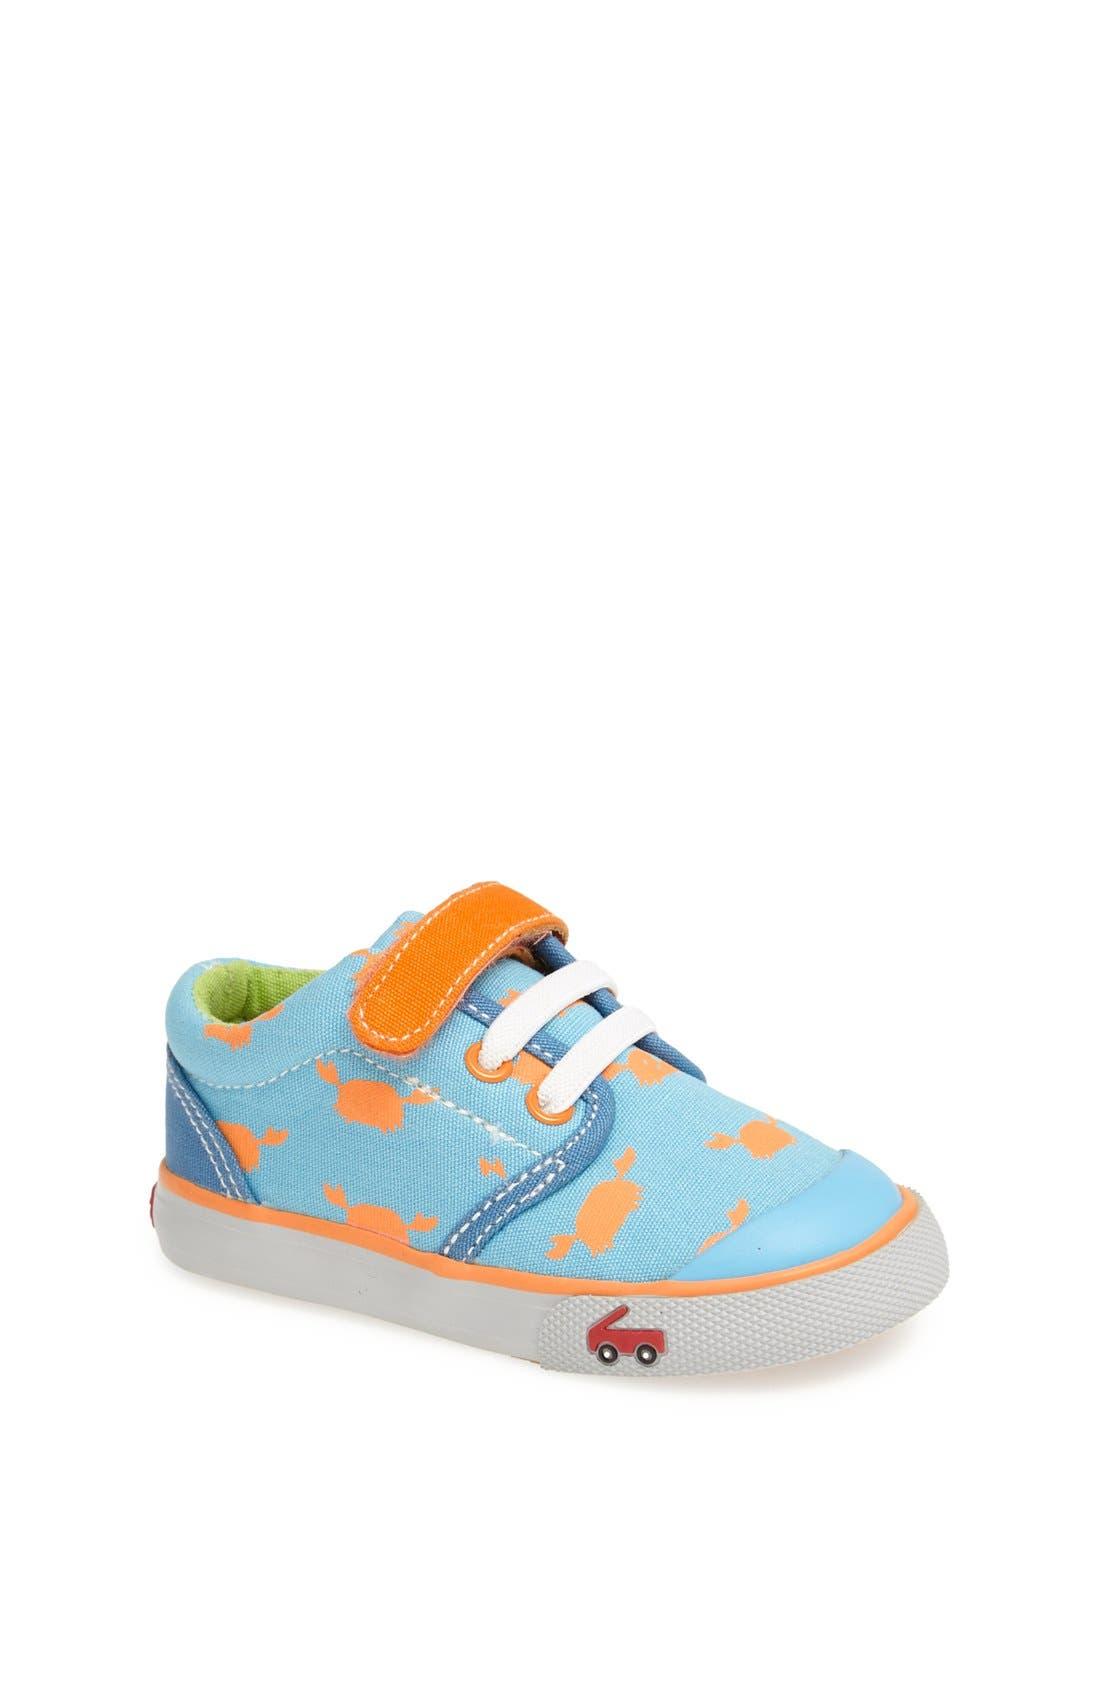 Main Image - See Kai Run 'Dieter' Sneaker (Baby, Walker & Toddler)